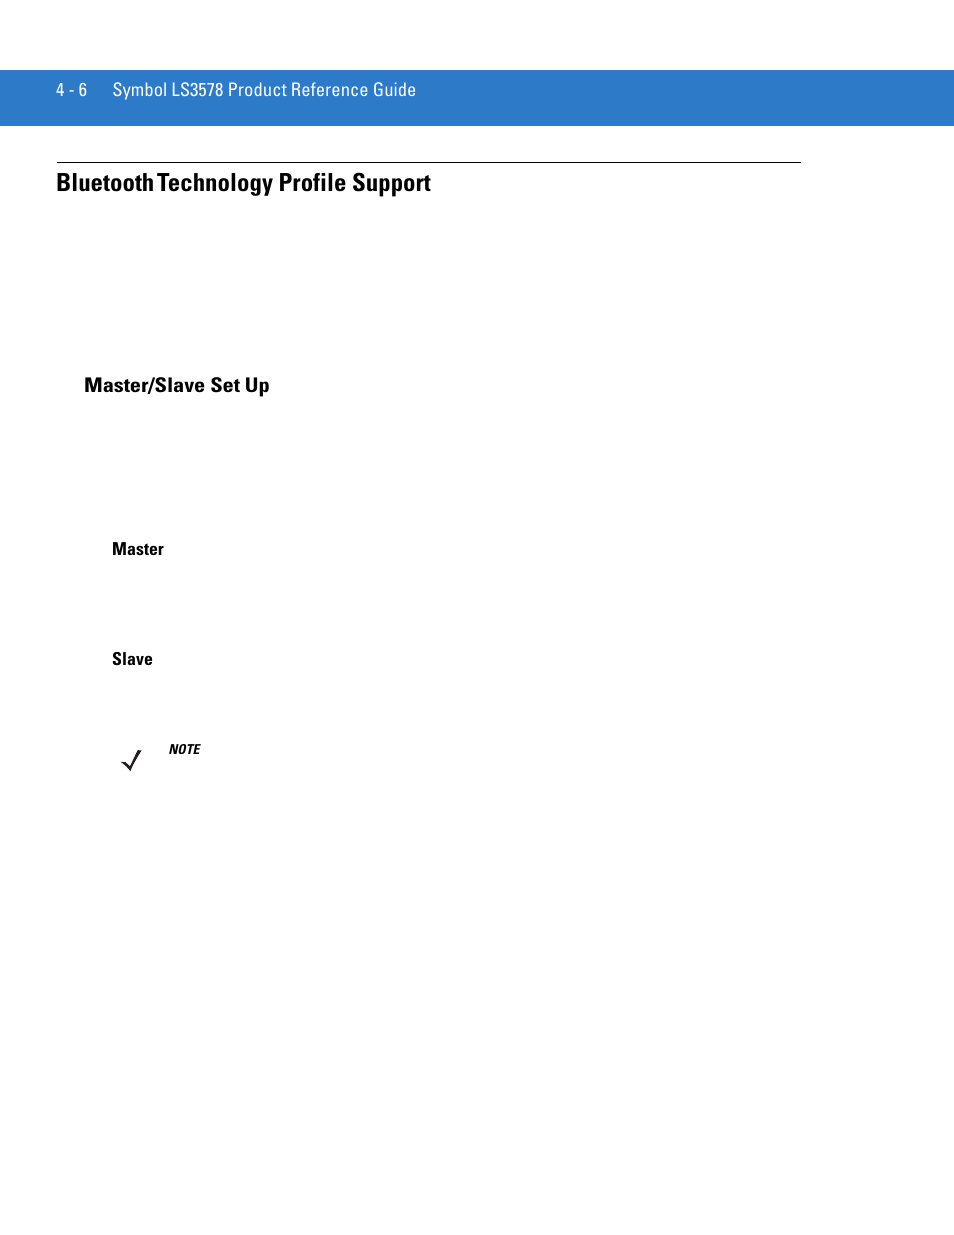 Bluetooth Technology Profile Support Masterslave Set Up Bluetooth